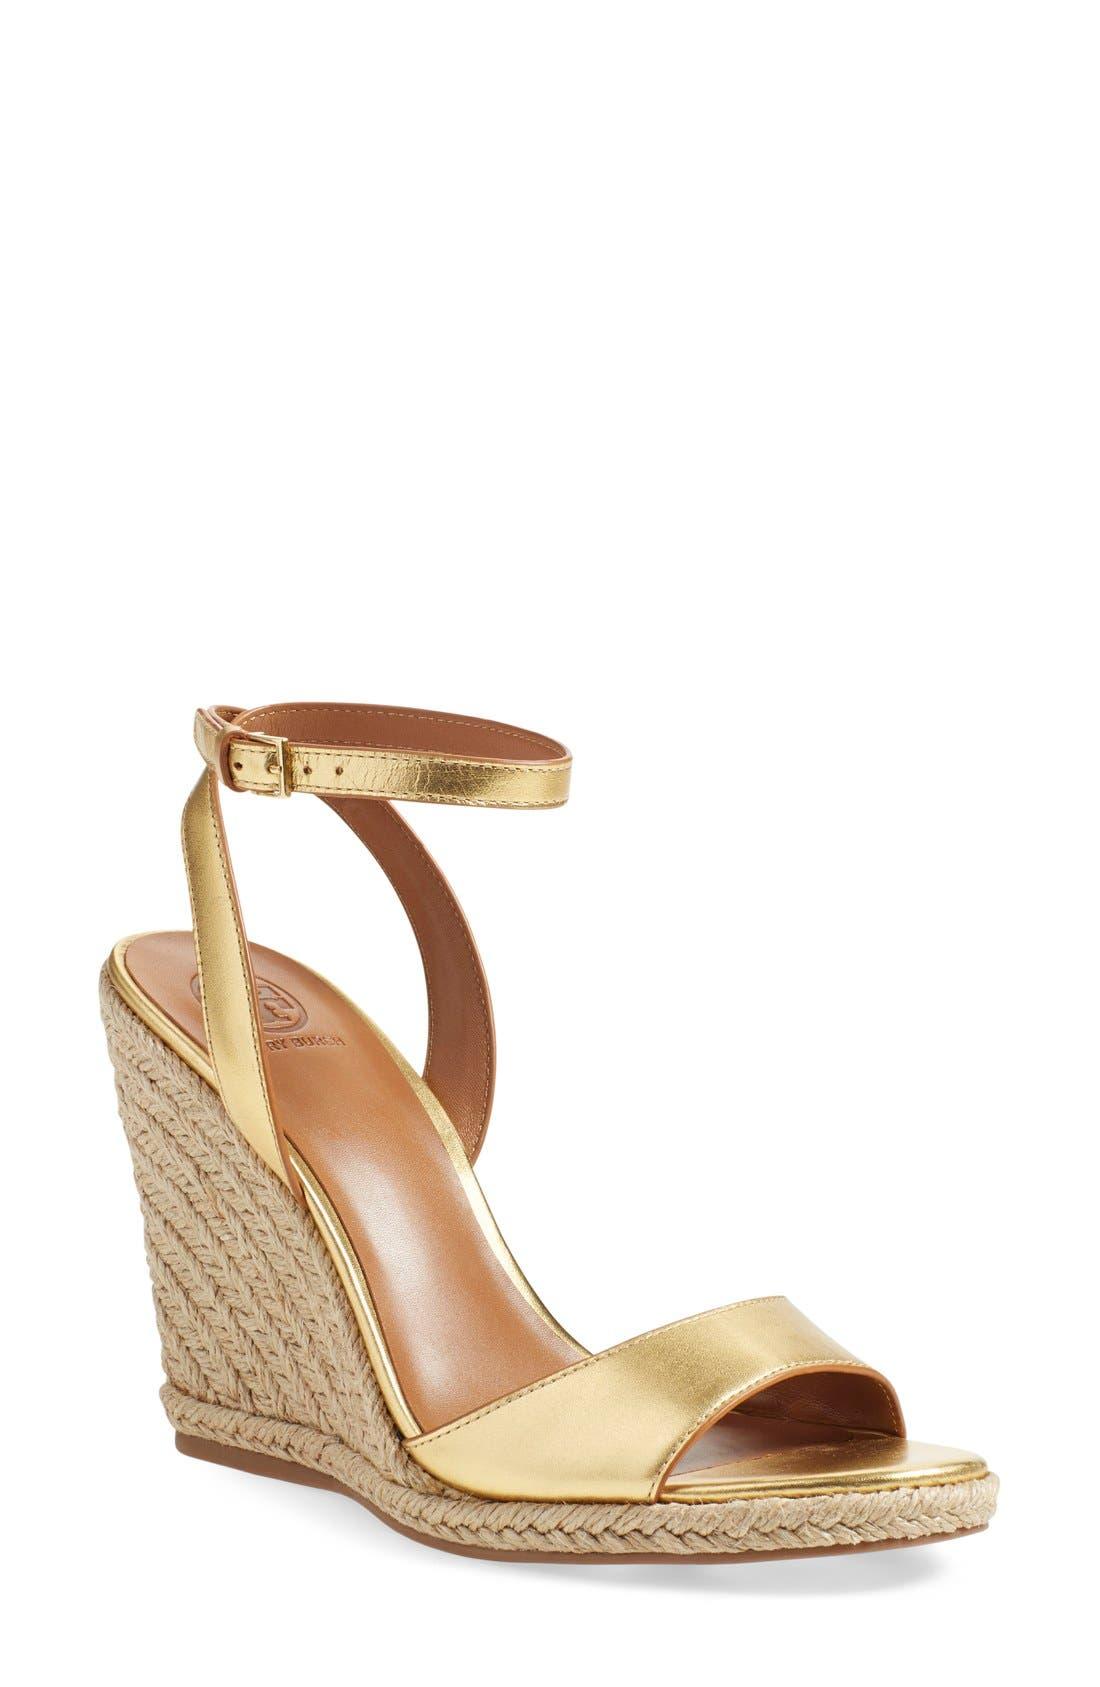 Wedge Sandal,                         Main,                         color, 710